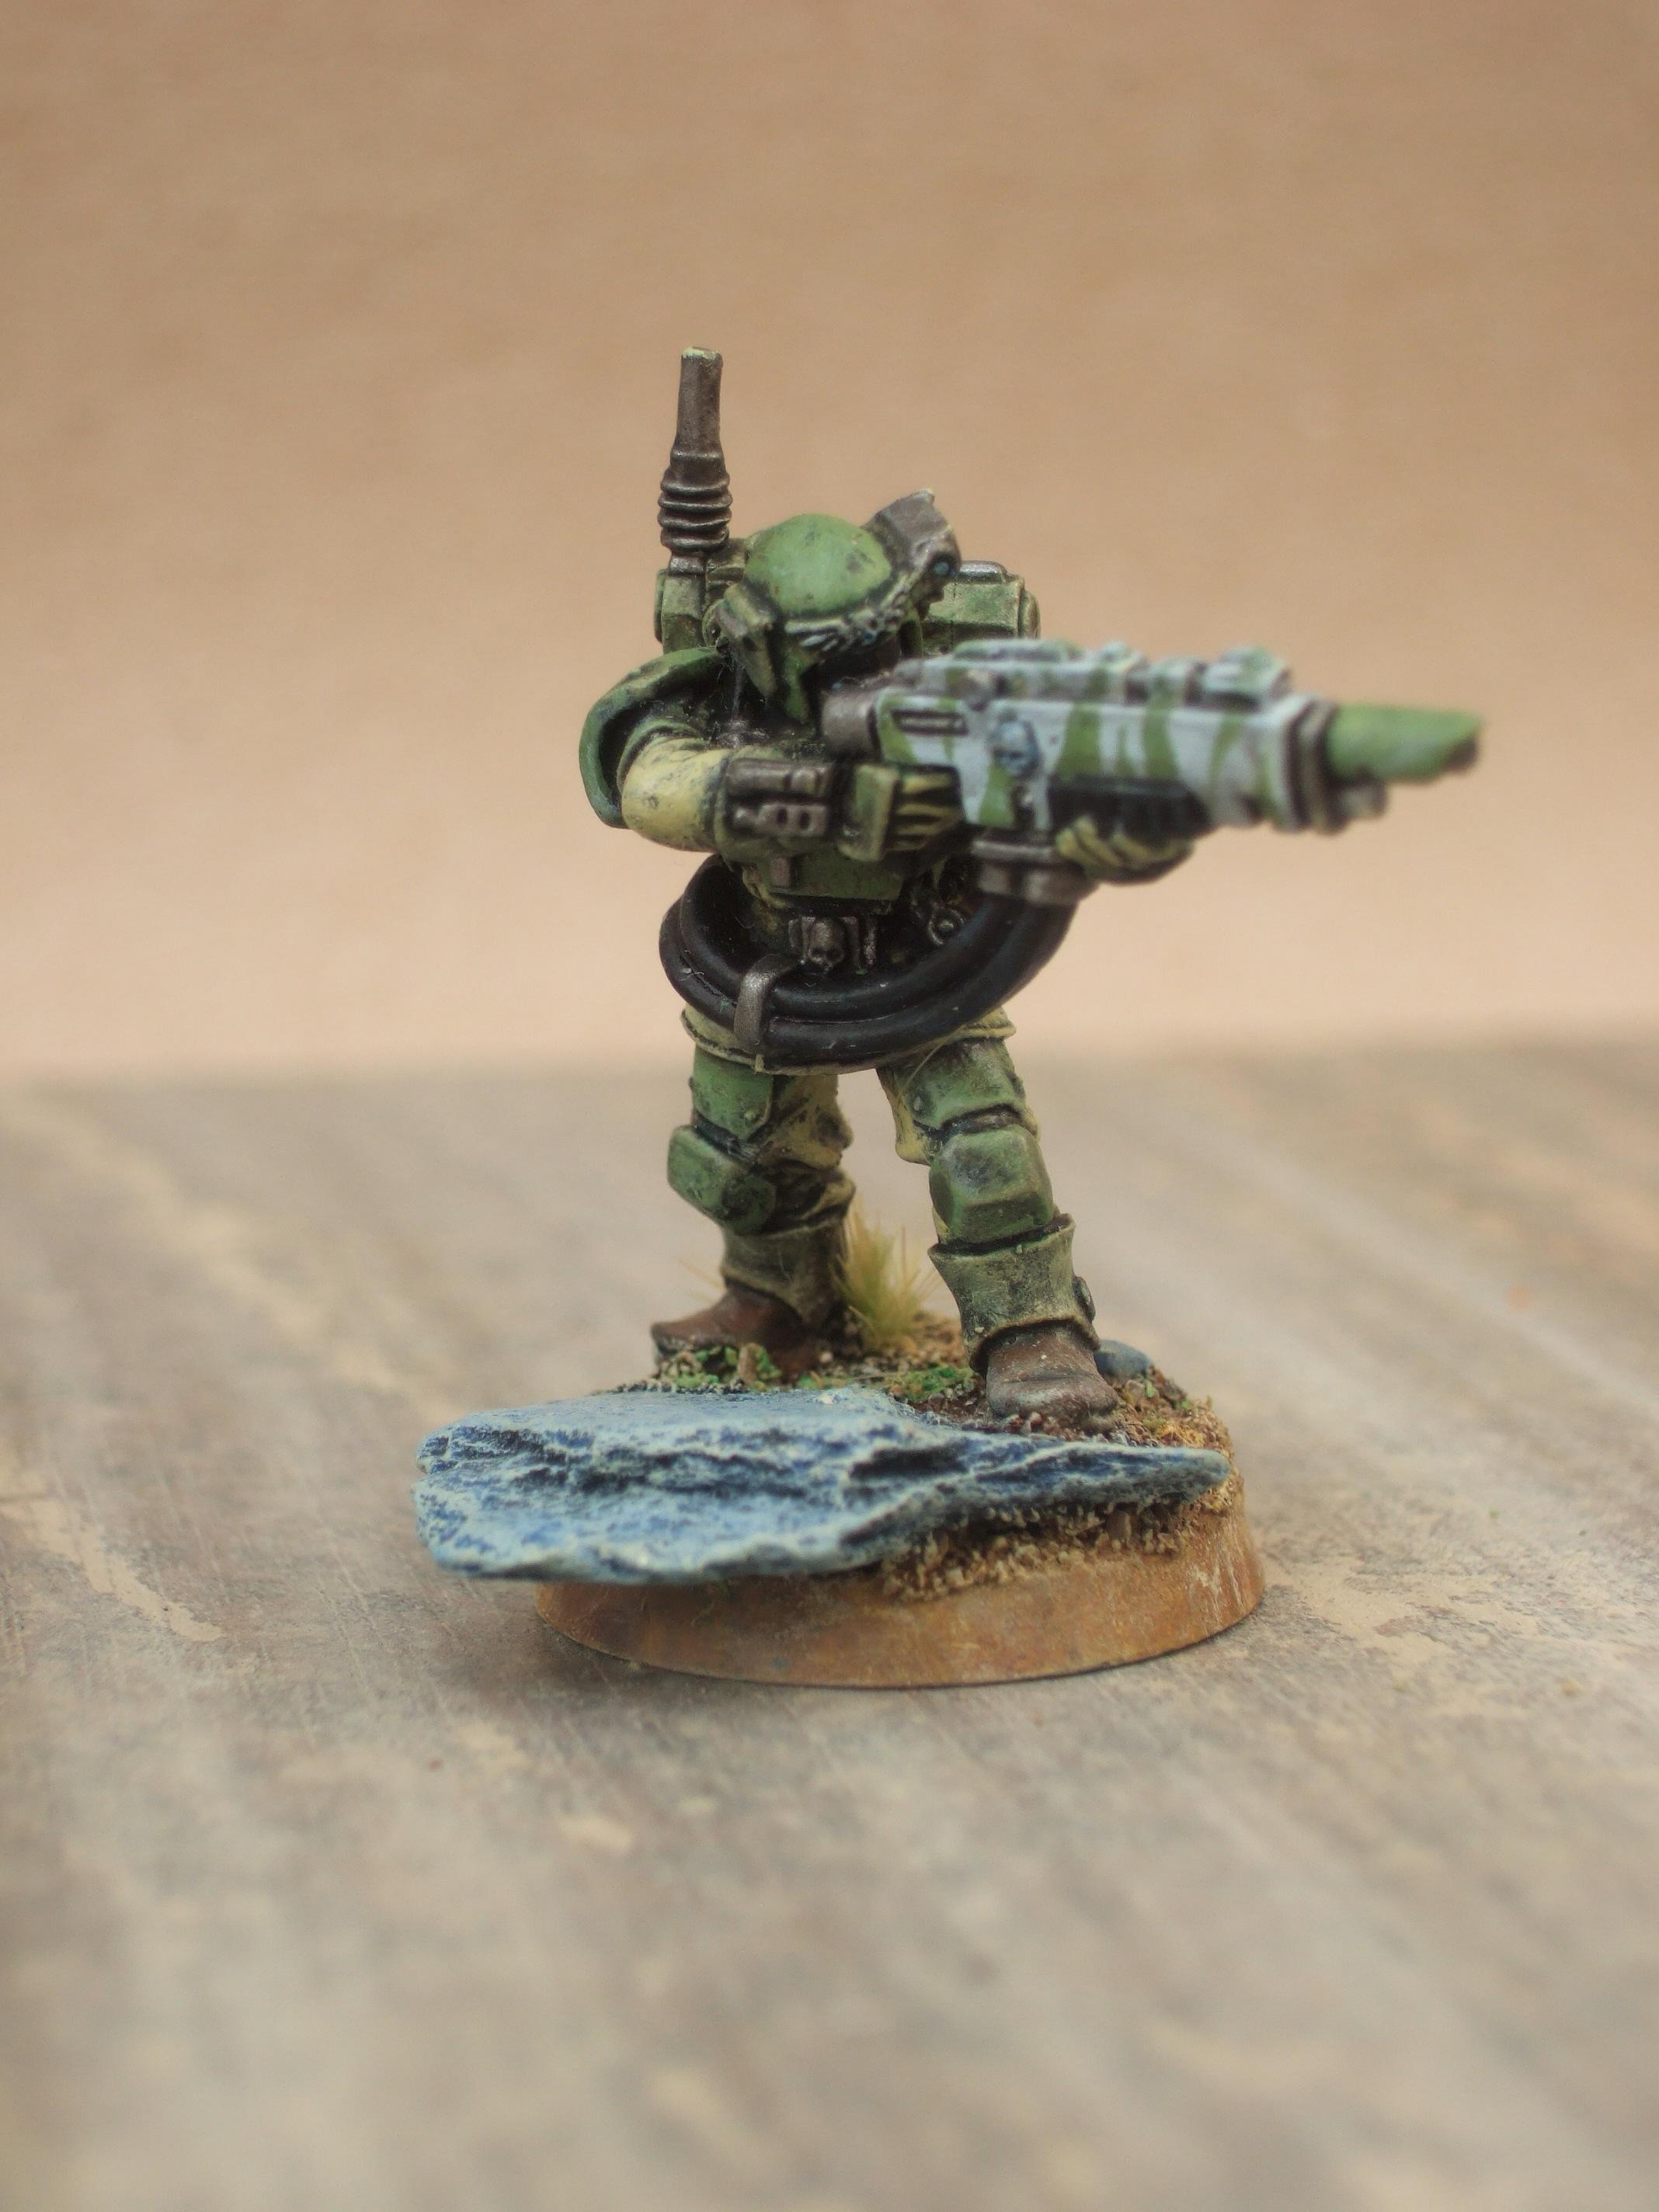 Imperial Guard, take aim